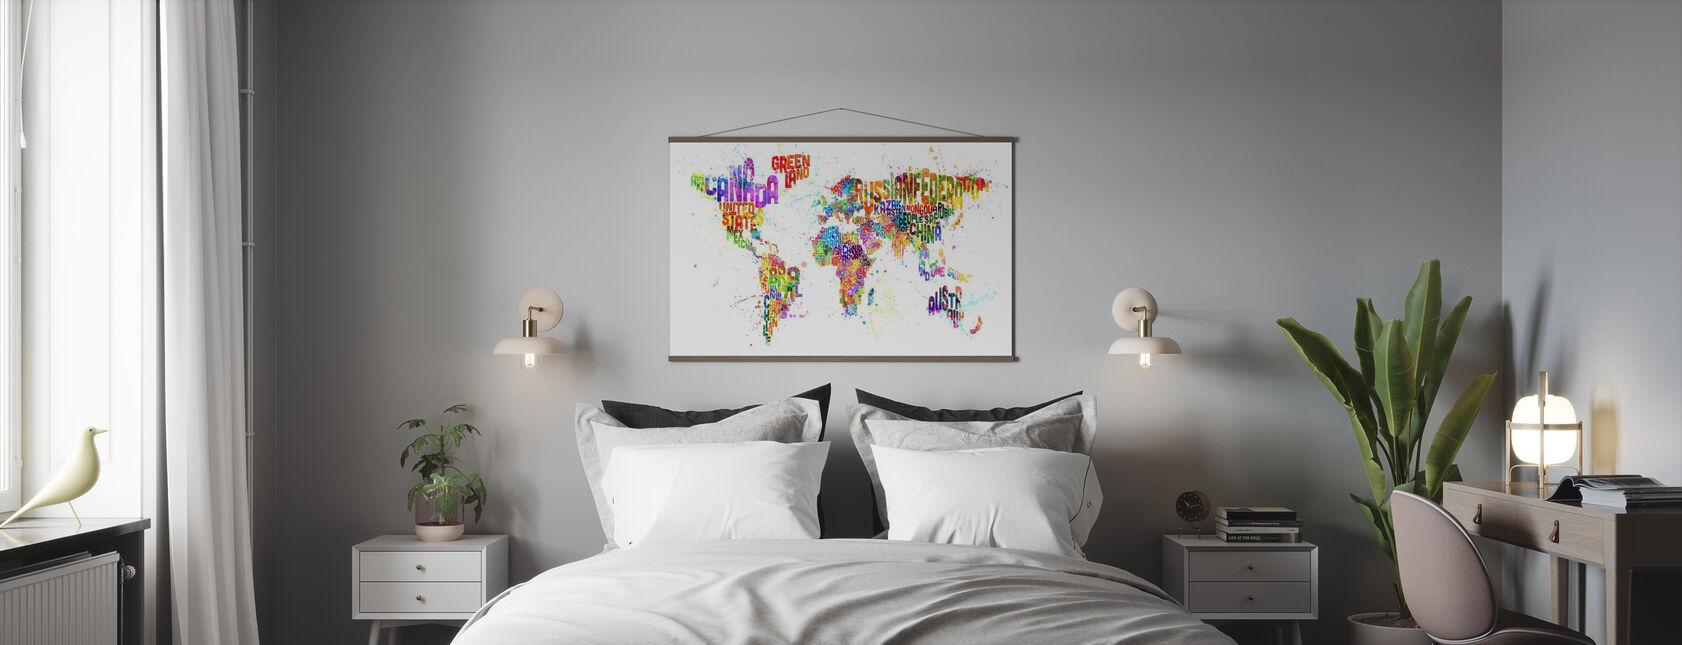 Typographic Text World Map Paint Splash - Poster - Bedroom